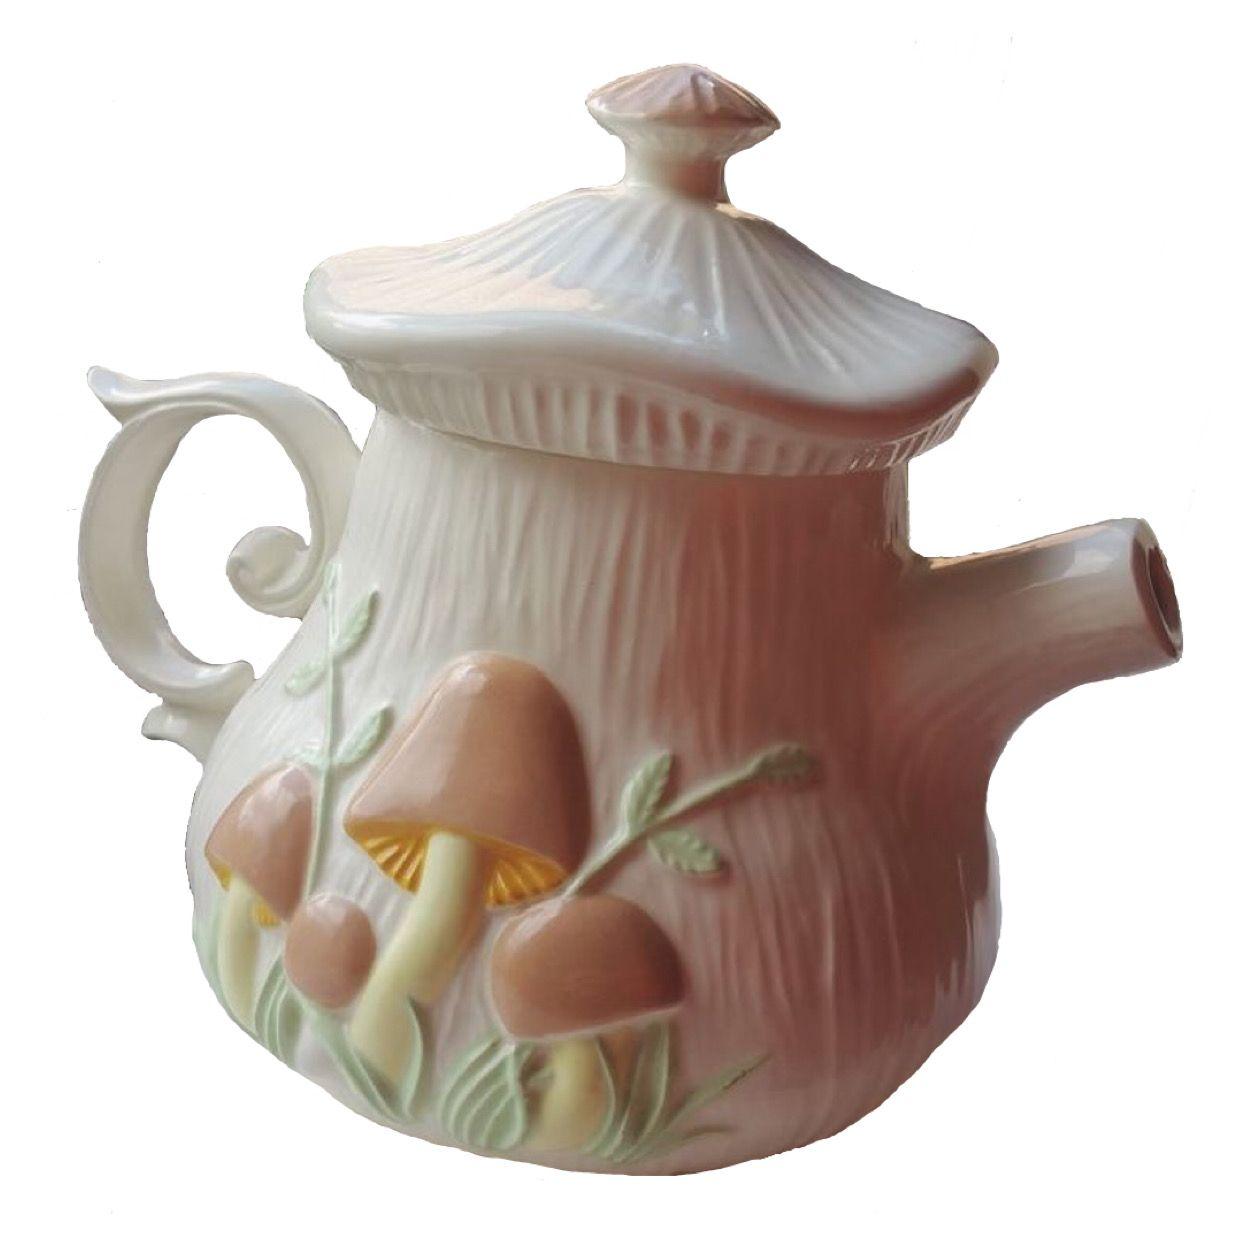 Mushroom Teapot Png Pottery Tumblr Stickers Tea Pots